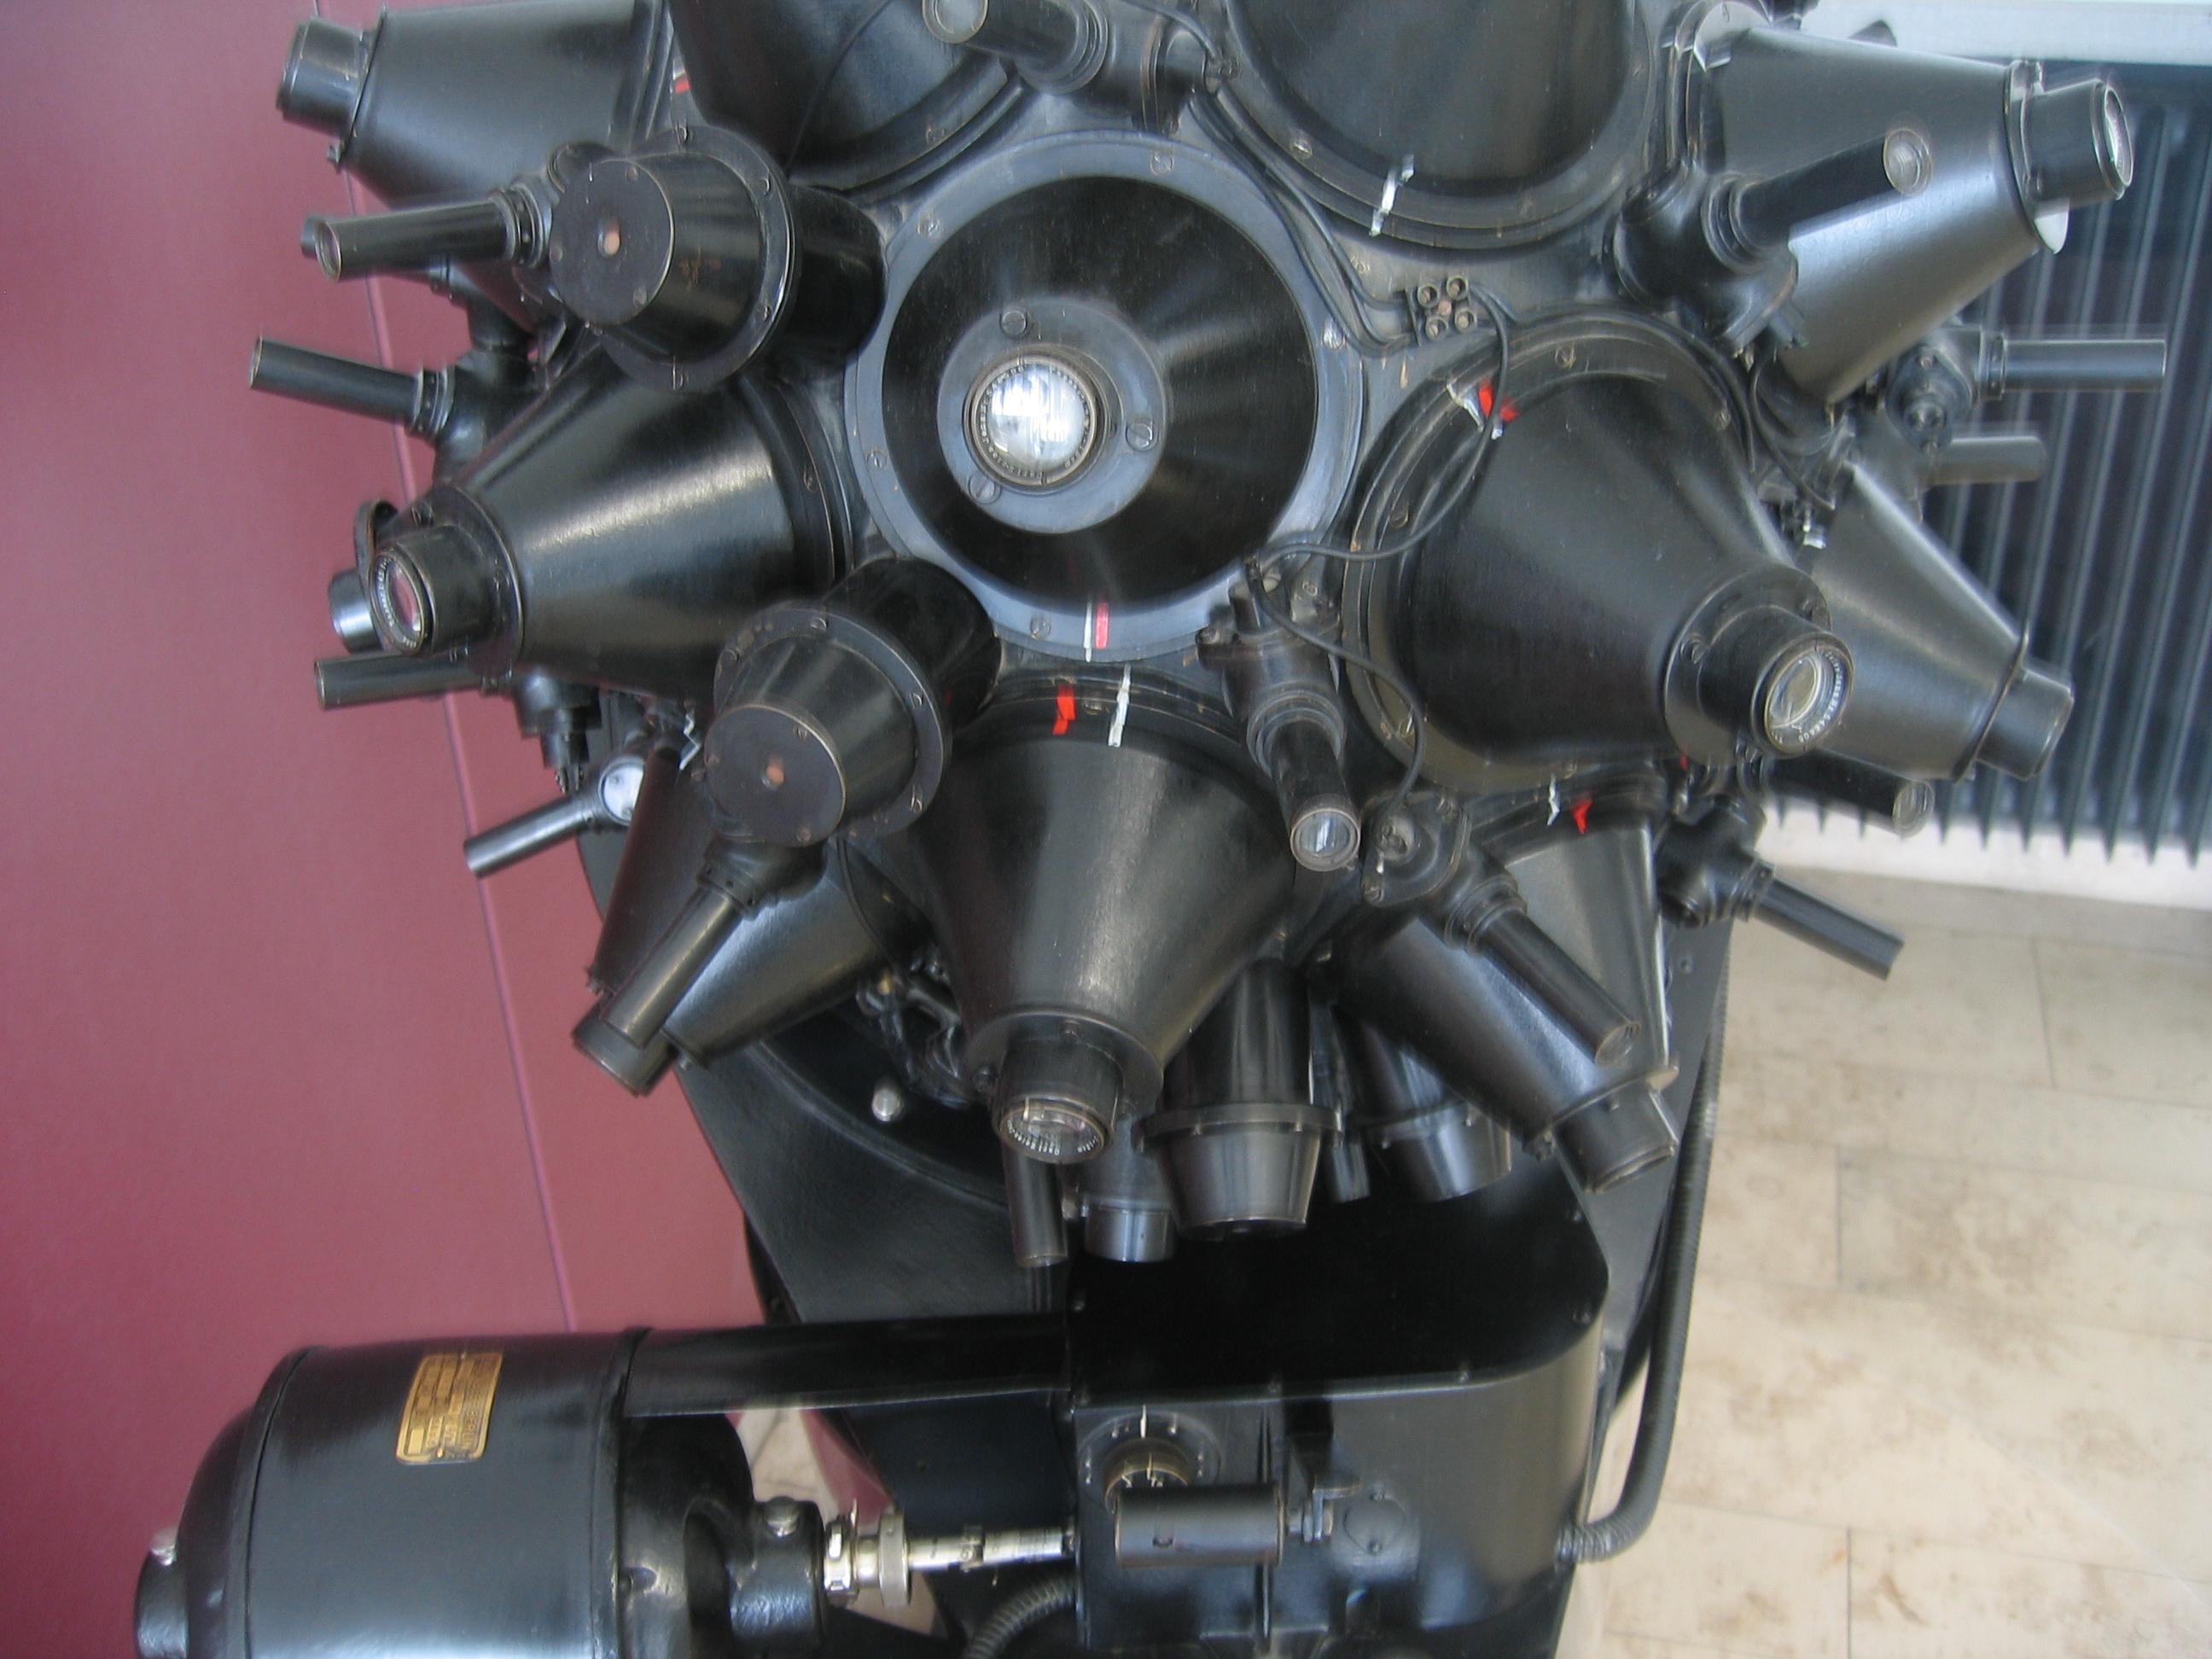 File:Deutsches Museum Planetarium projector side JPG